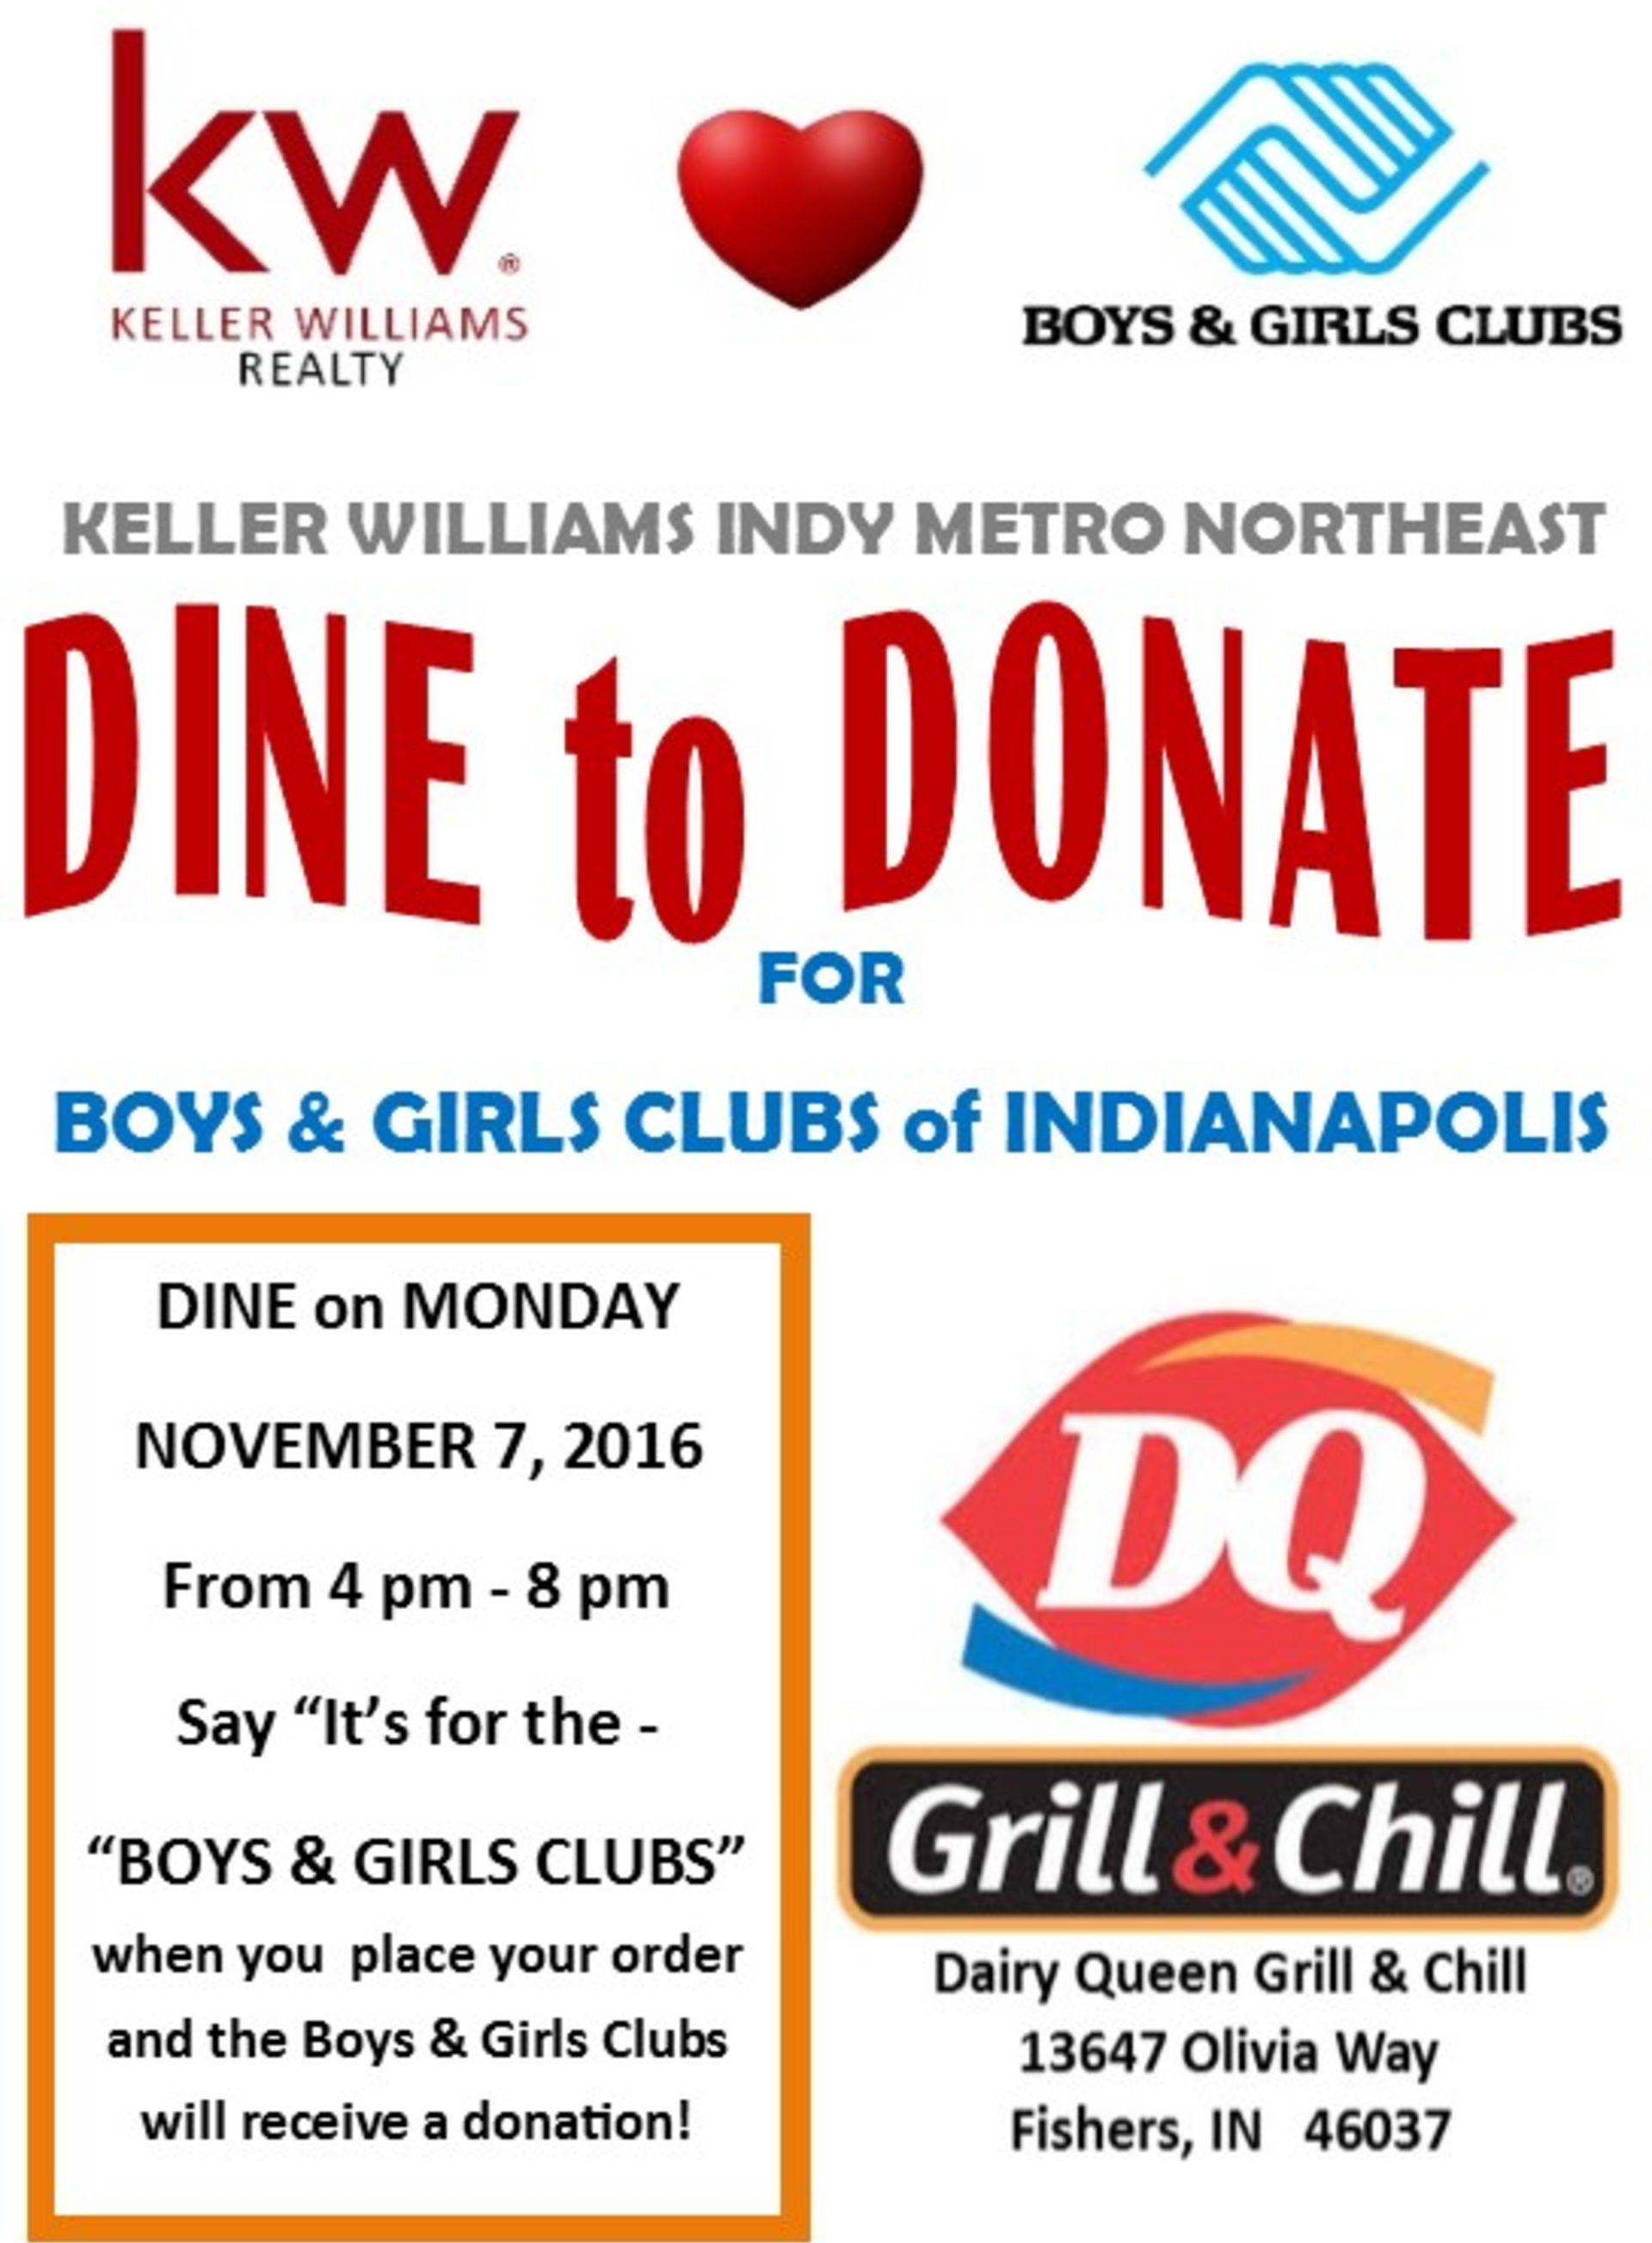 Bonus Dine-to-Donate Event: DQ Cones for a Cause!